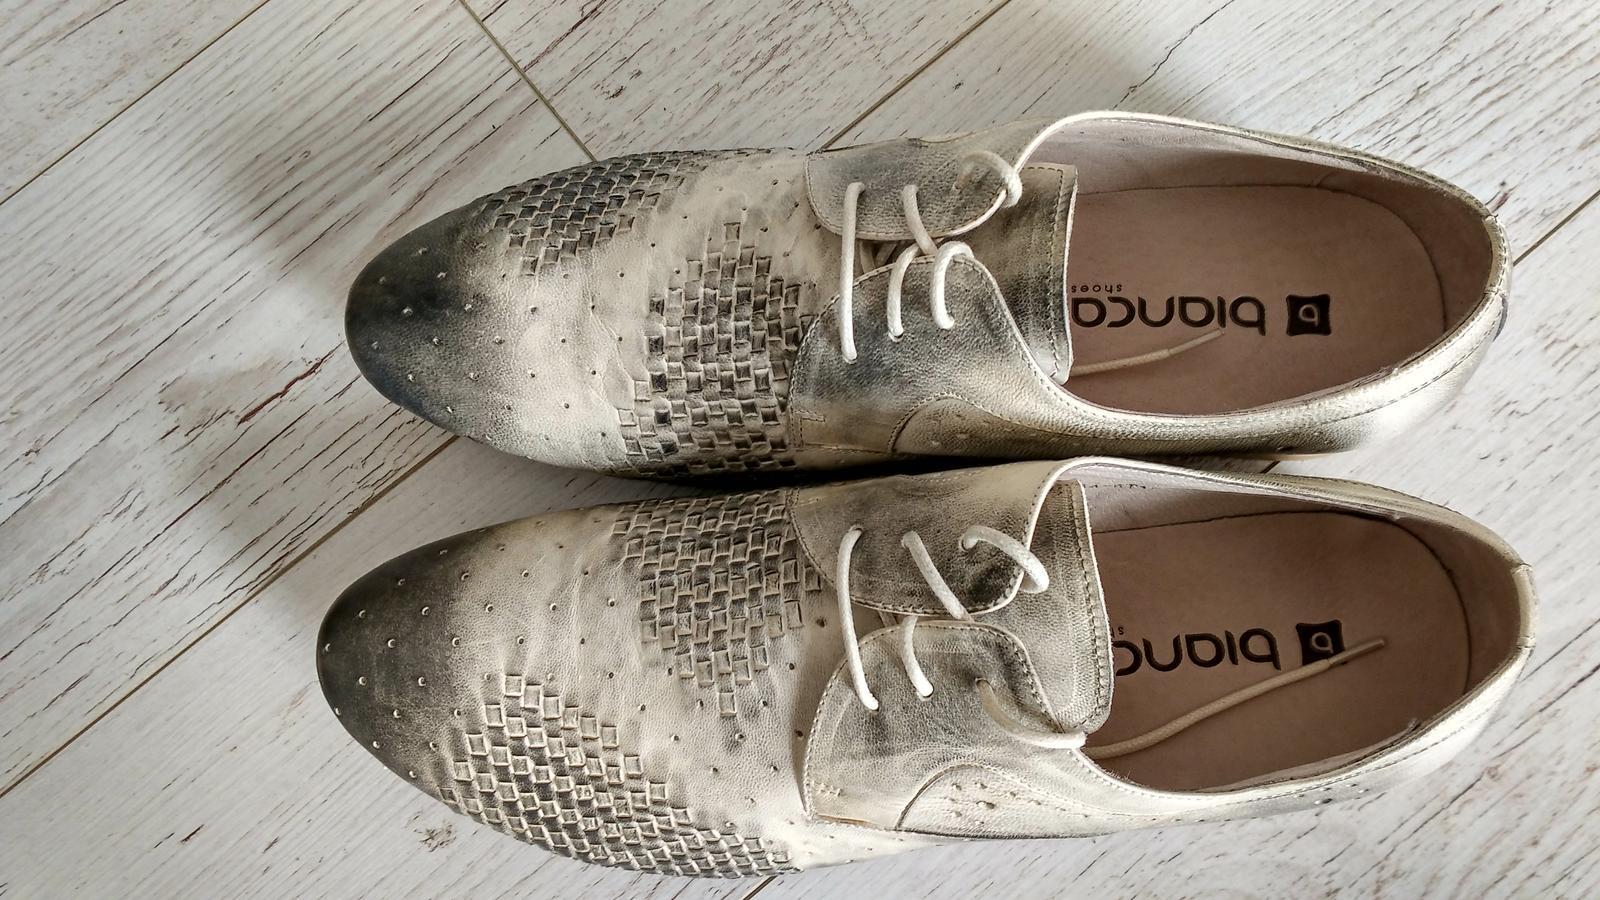 Pánske spoločenské topánky - Obrázok č. 1